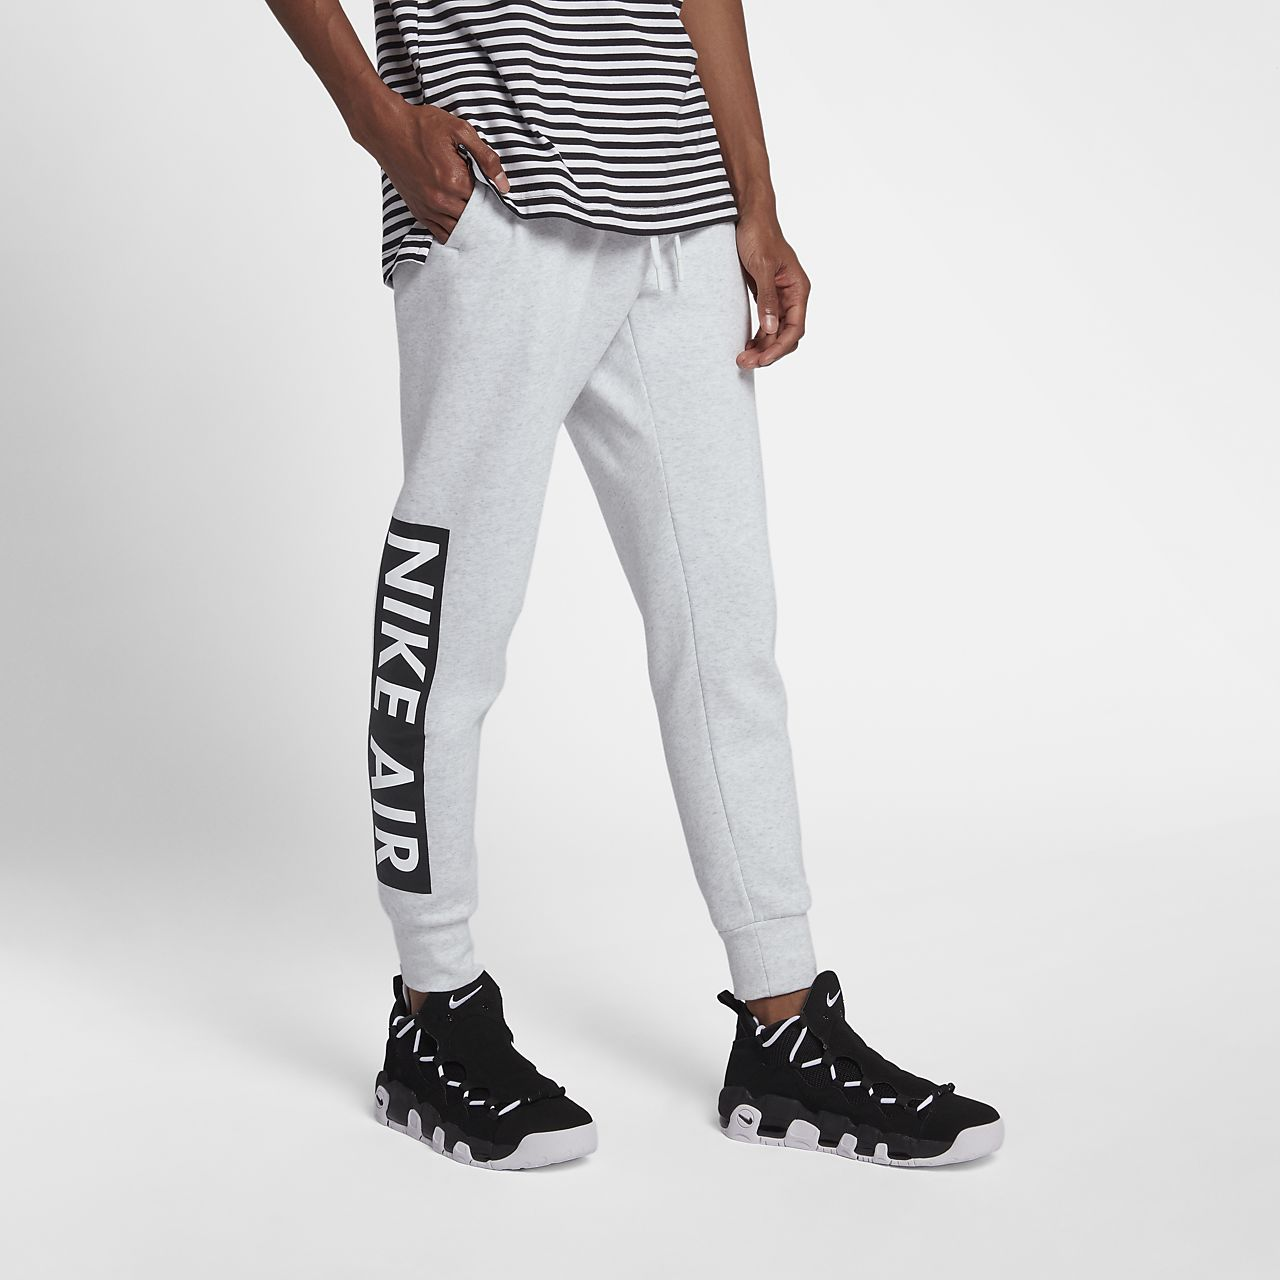 Fleece Air Pour Ca Tissu Nike Pantalon Homme En gOWzUgxE